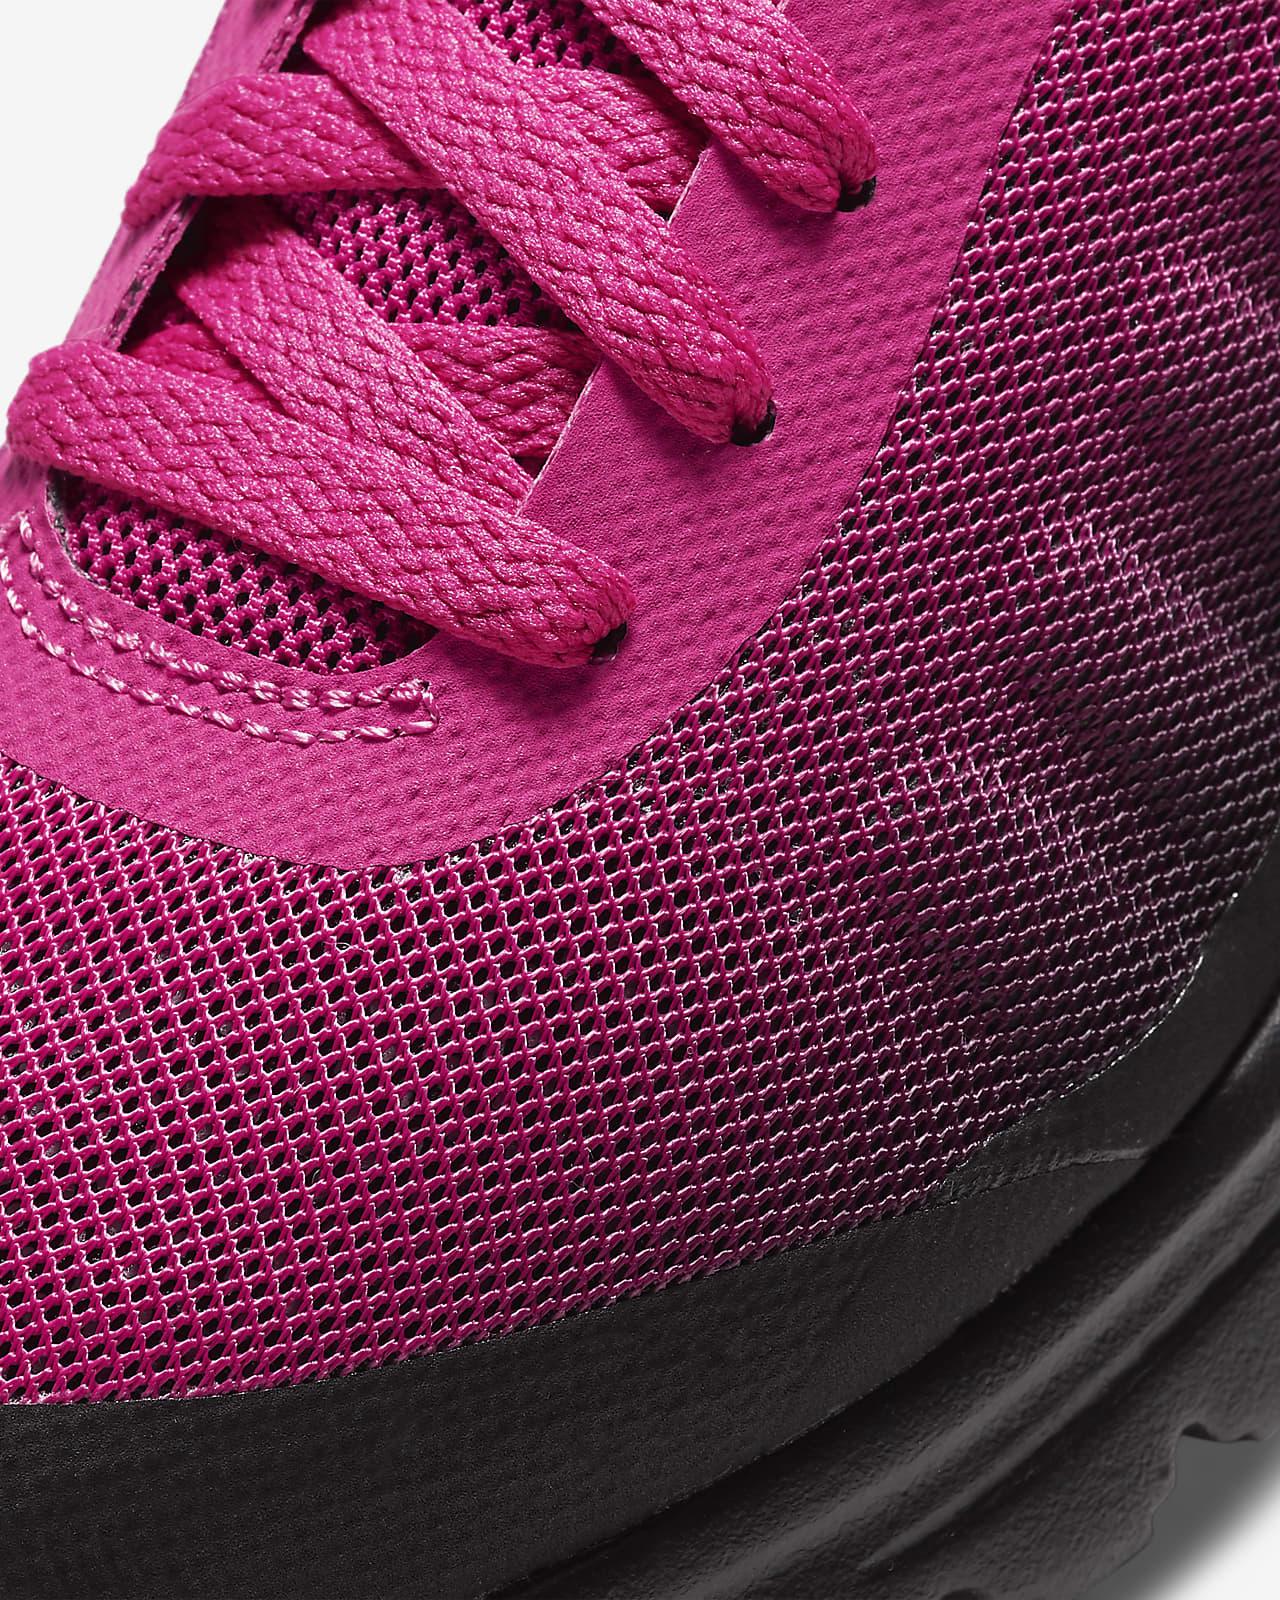 Chaussure Nike Air Max Invigor pour Enfant plus âgé. Nike LU